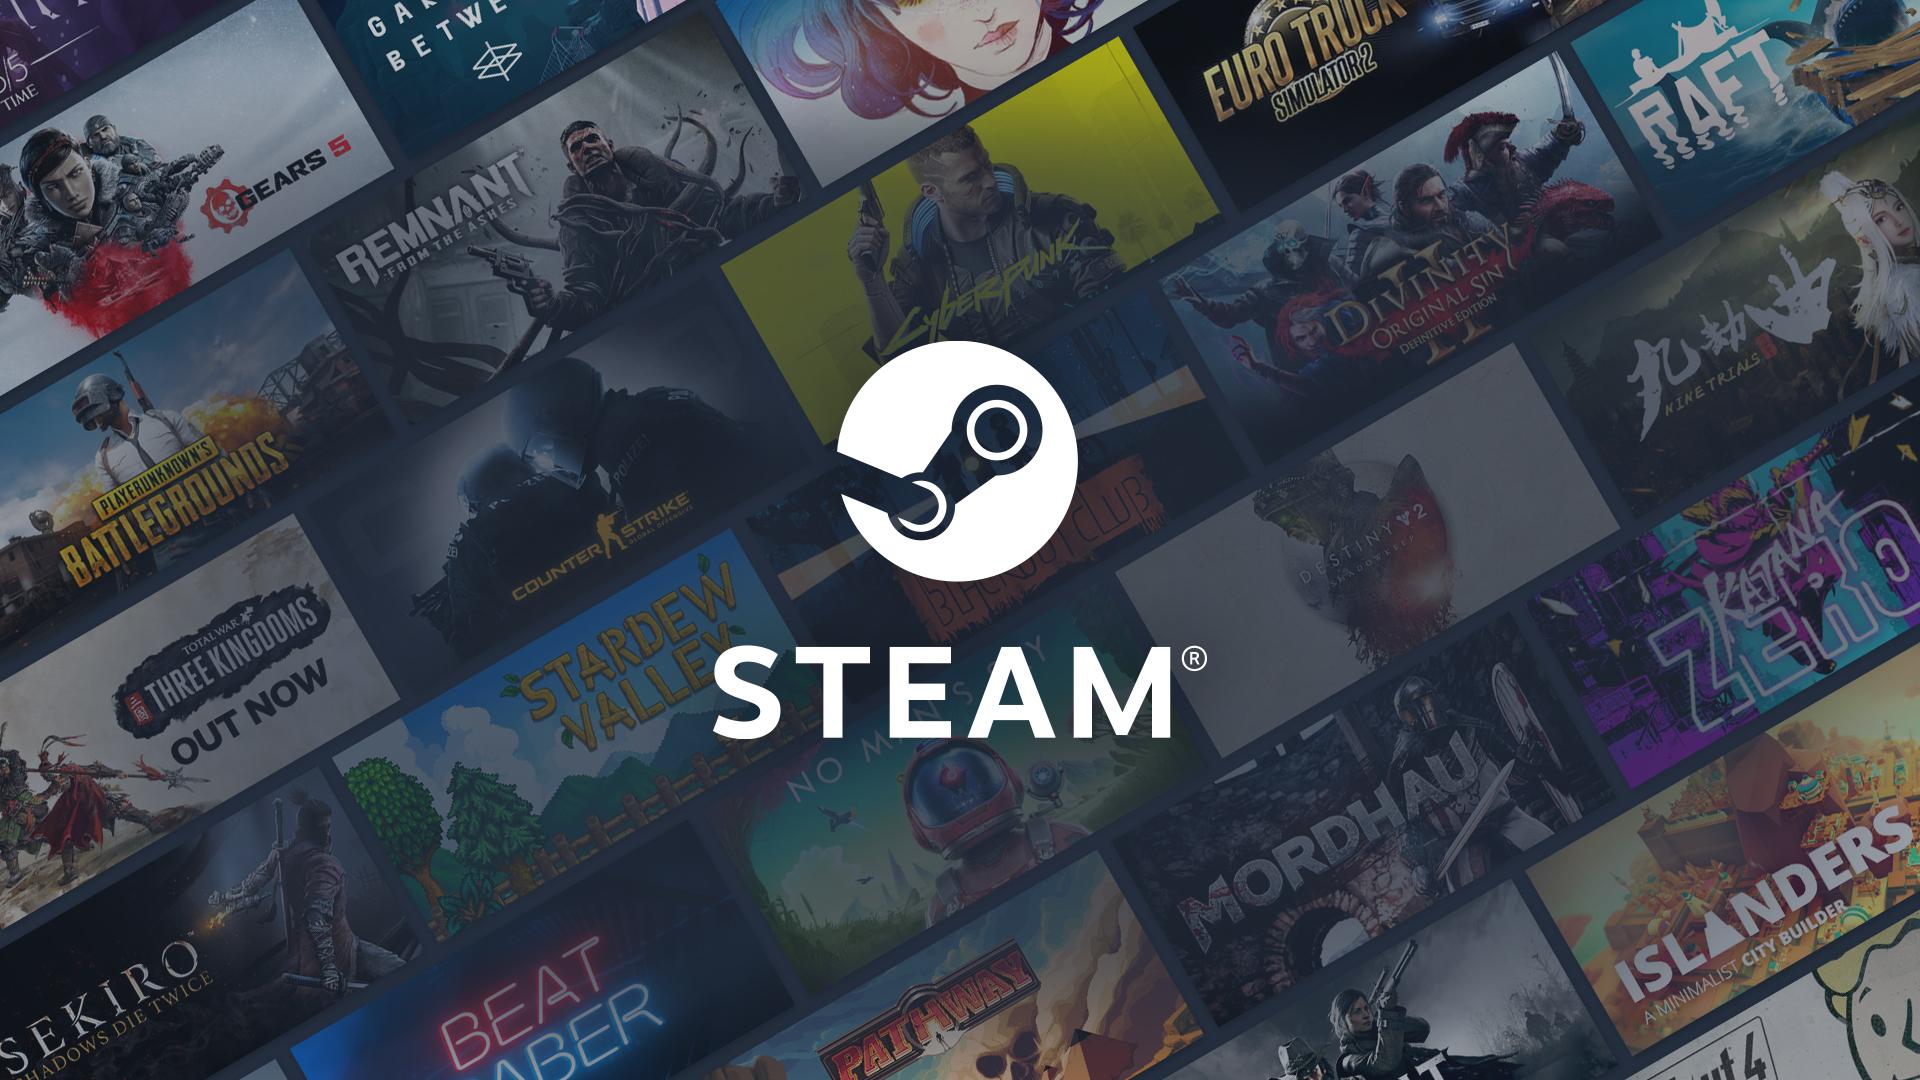 V社公布Steam新功能:开发者可邀请玩家测试自己的游戏